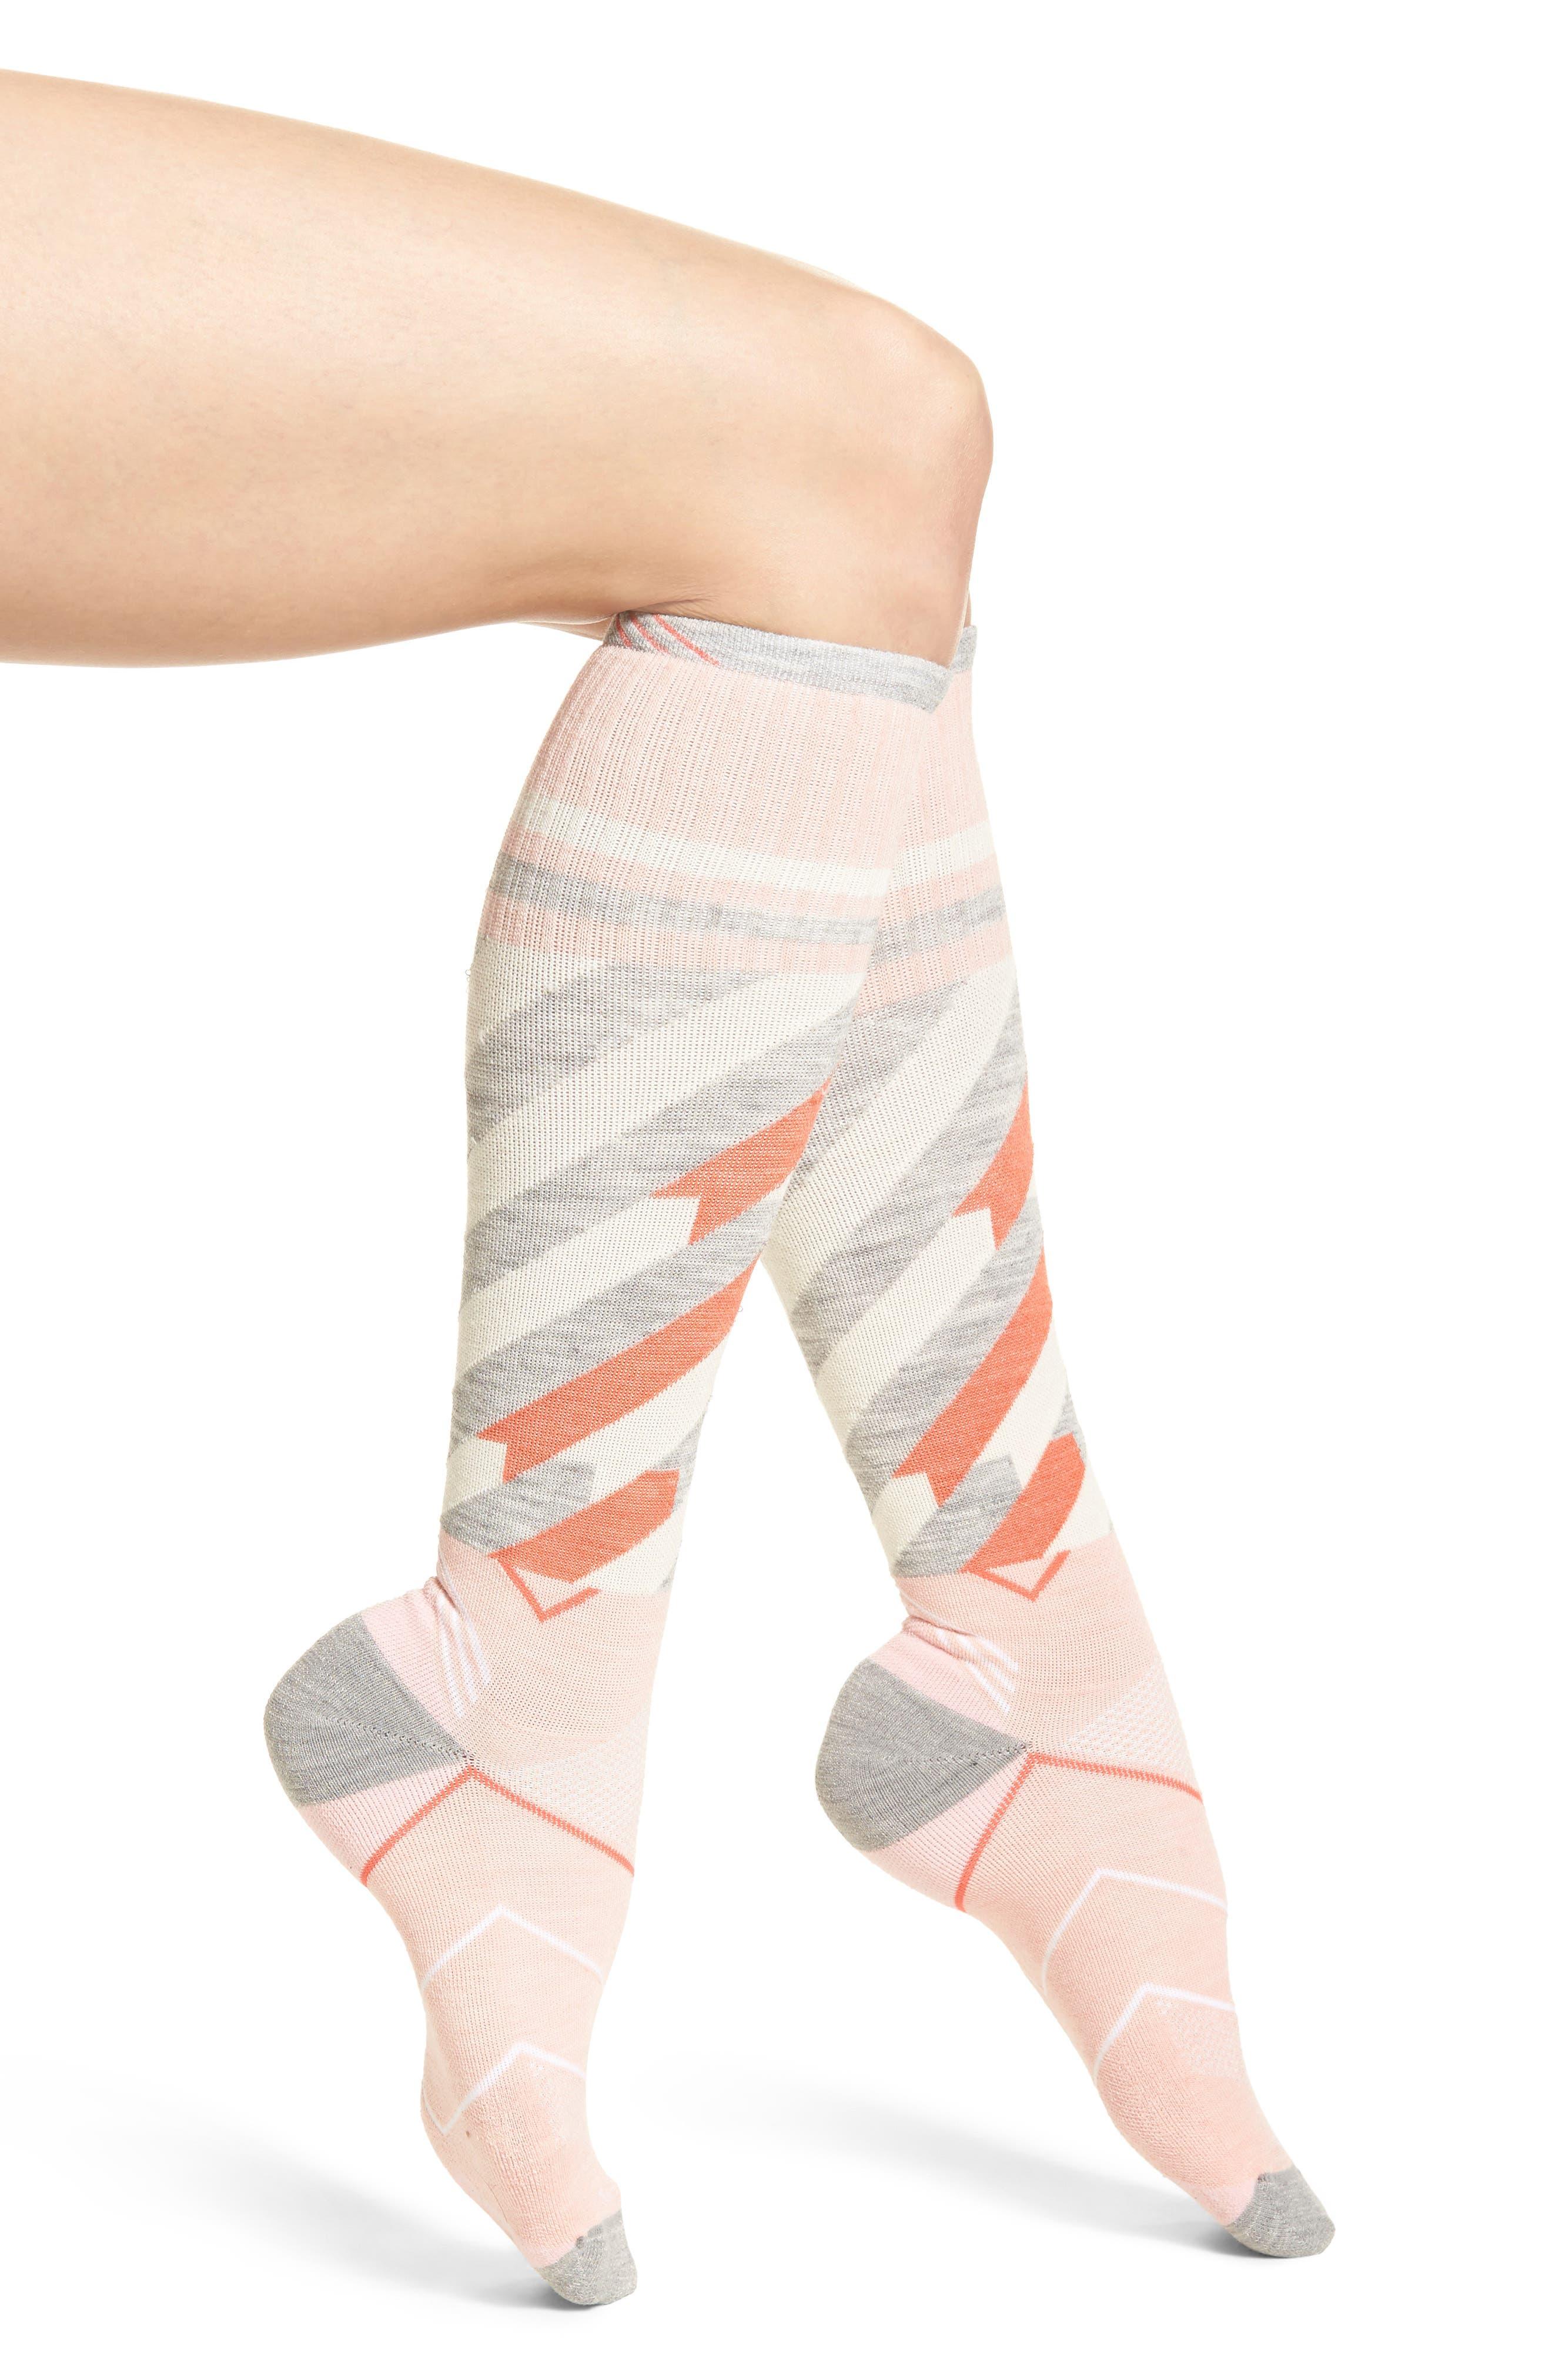 Cyclone Compression Knee Socks,                         Main,                         color, 650